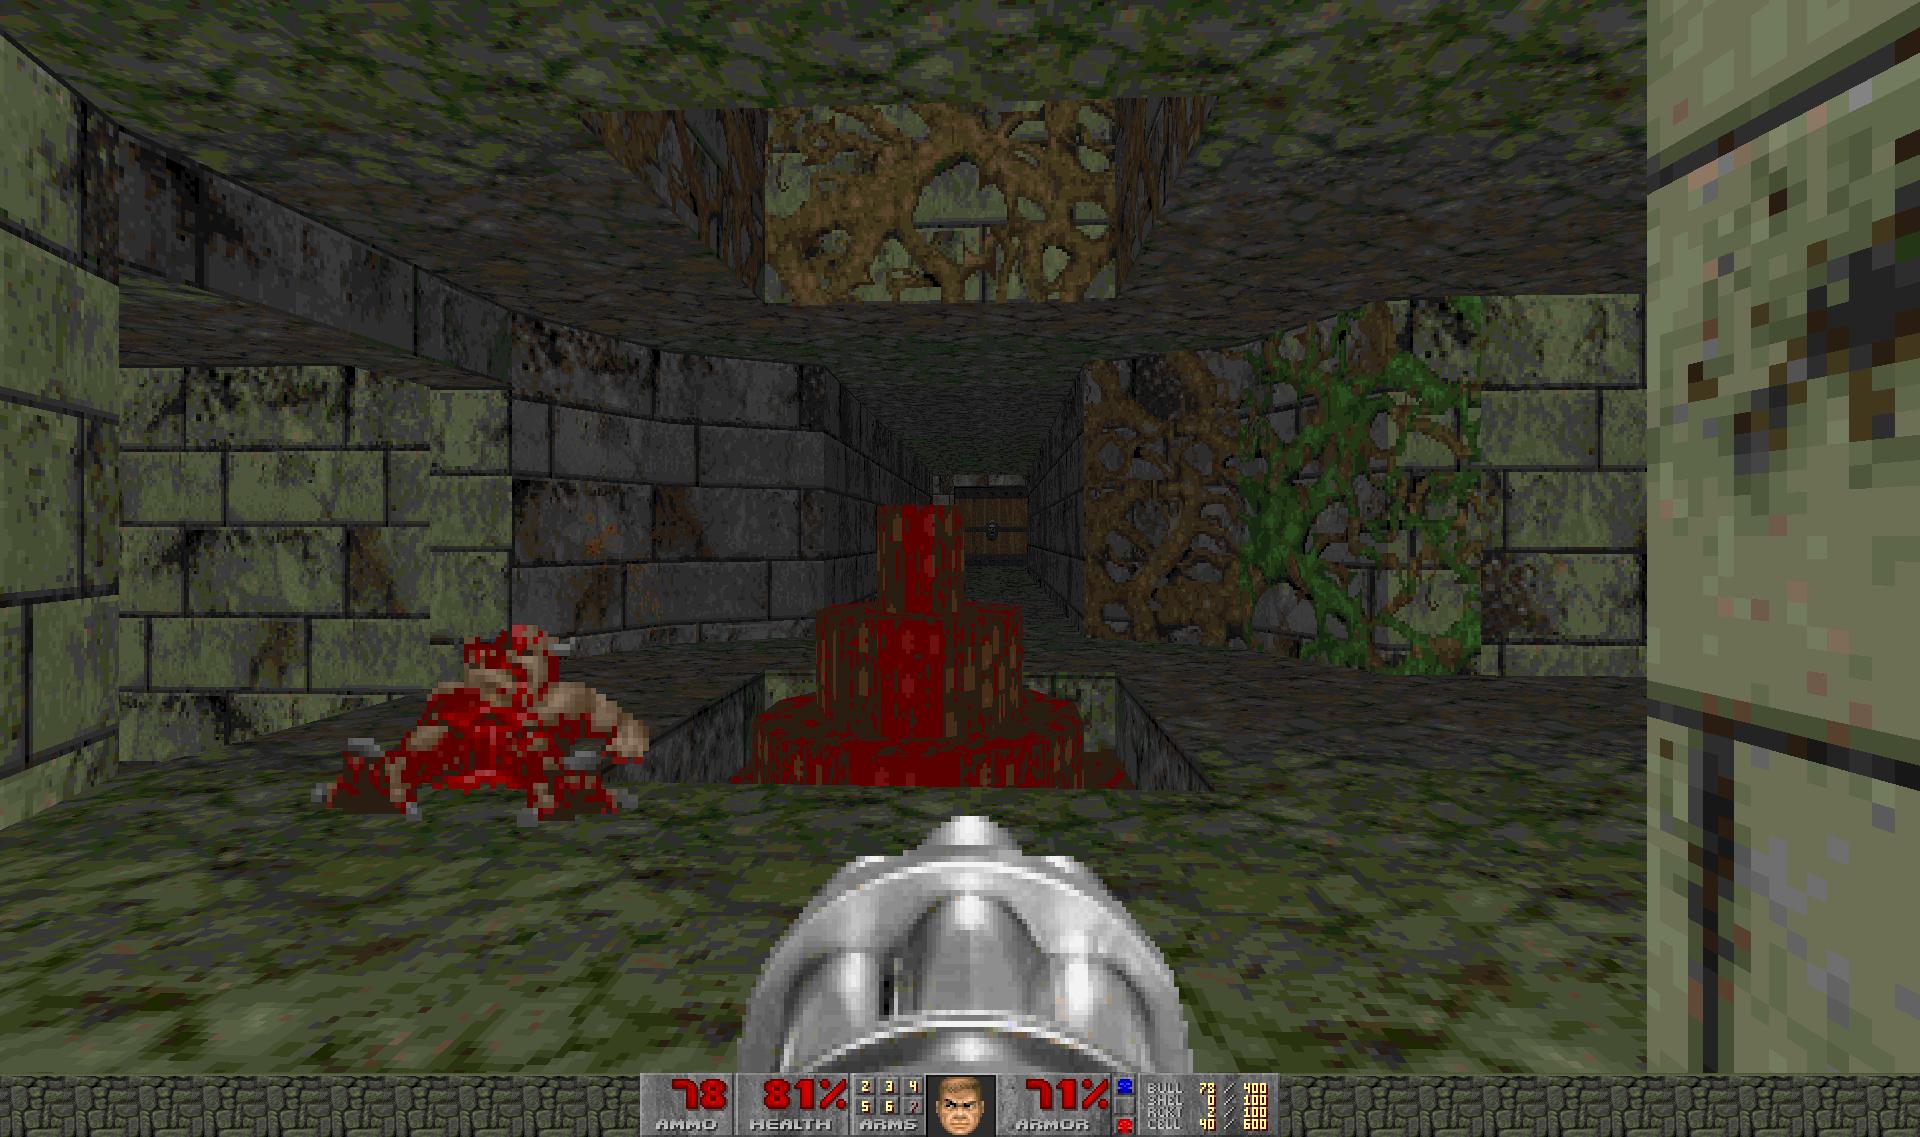 Screenshot_Doom_20210325_125936.png.2c2fbe0346b23cf651b80708190b3994.png